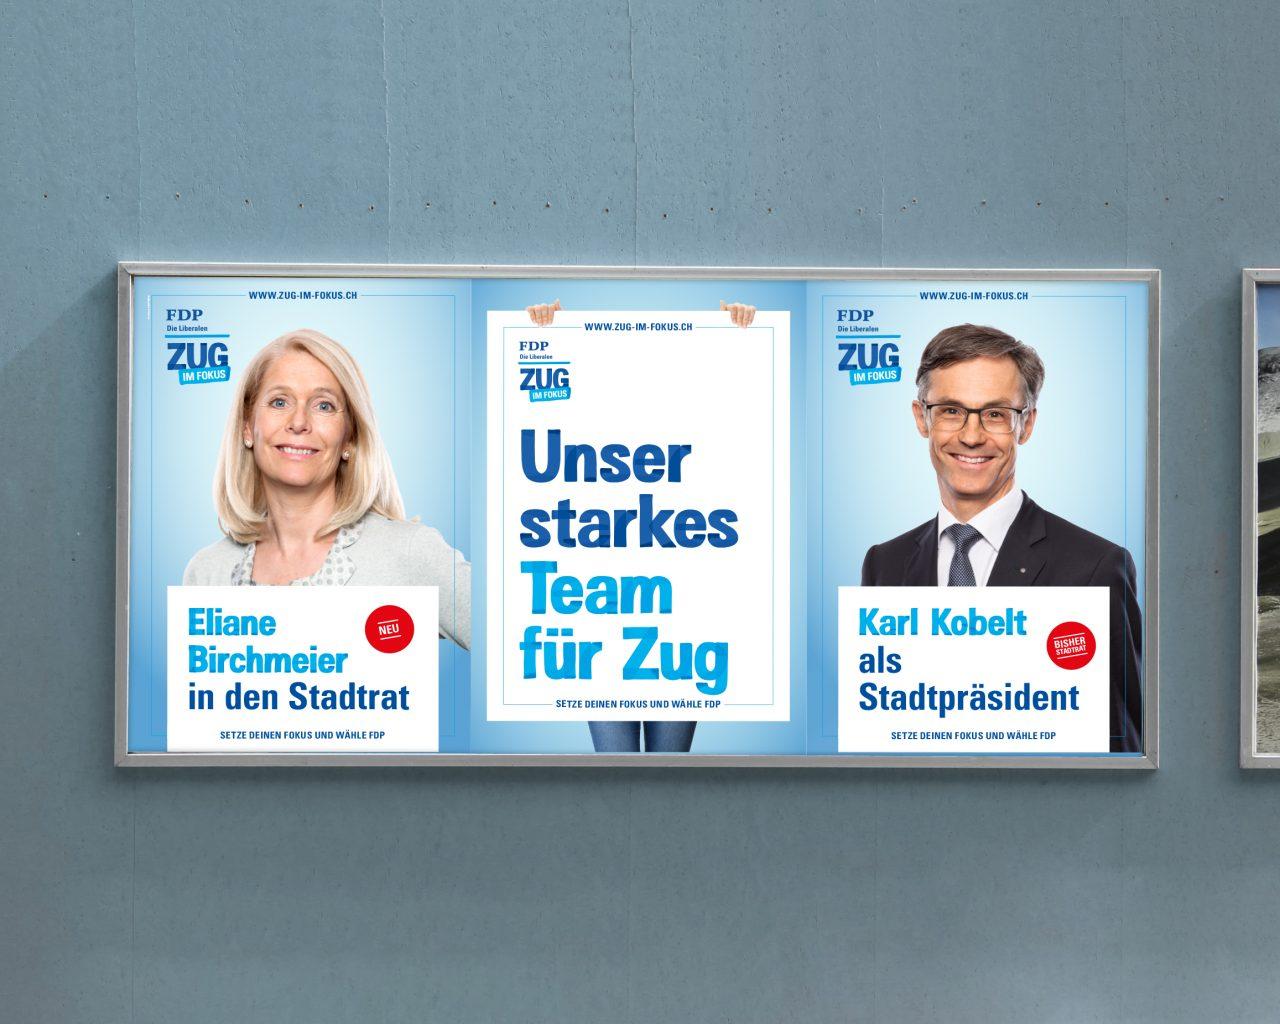 AGENTMEDIA_fdp_wahlkampf_zug